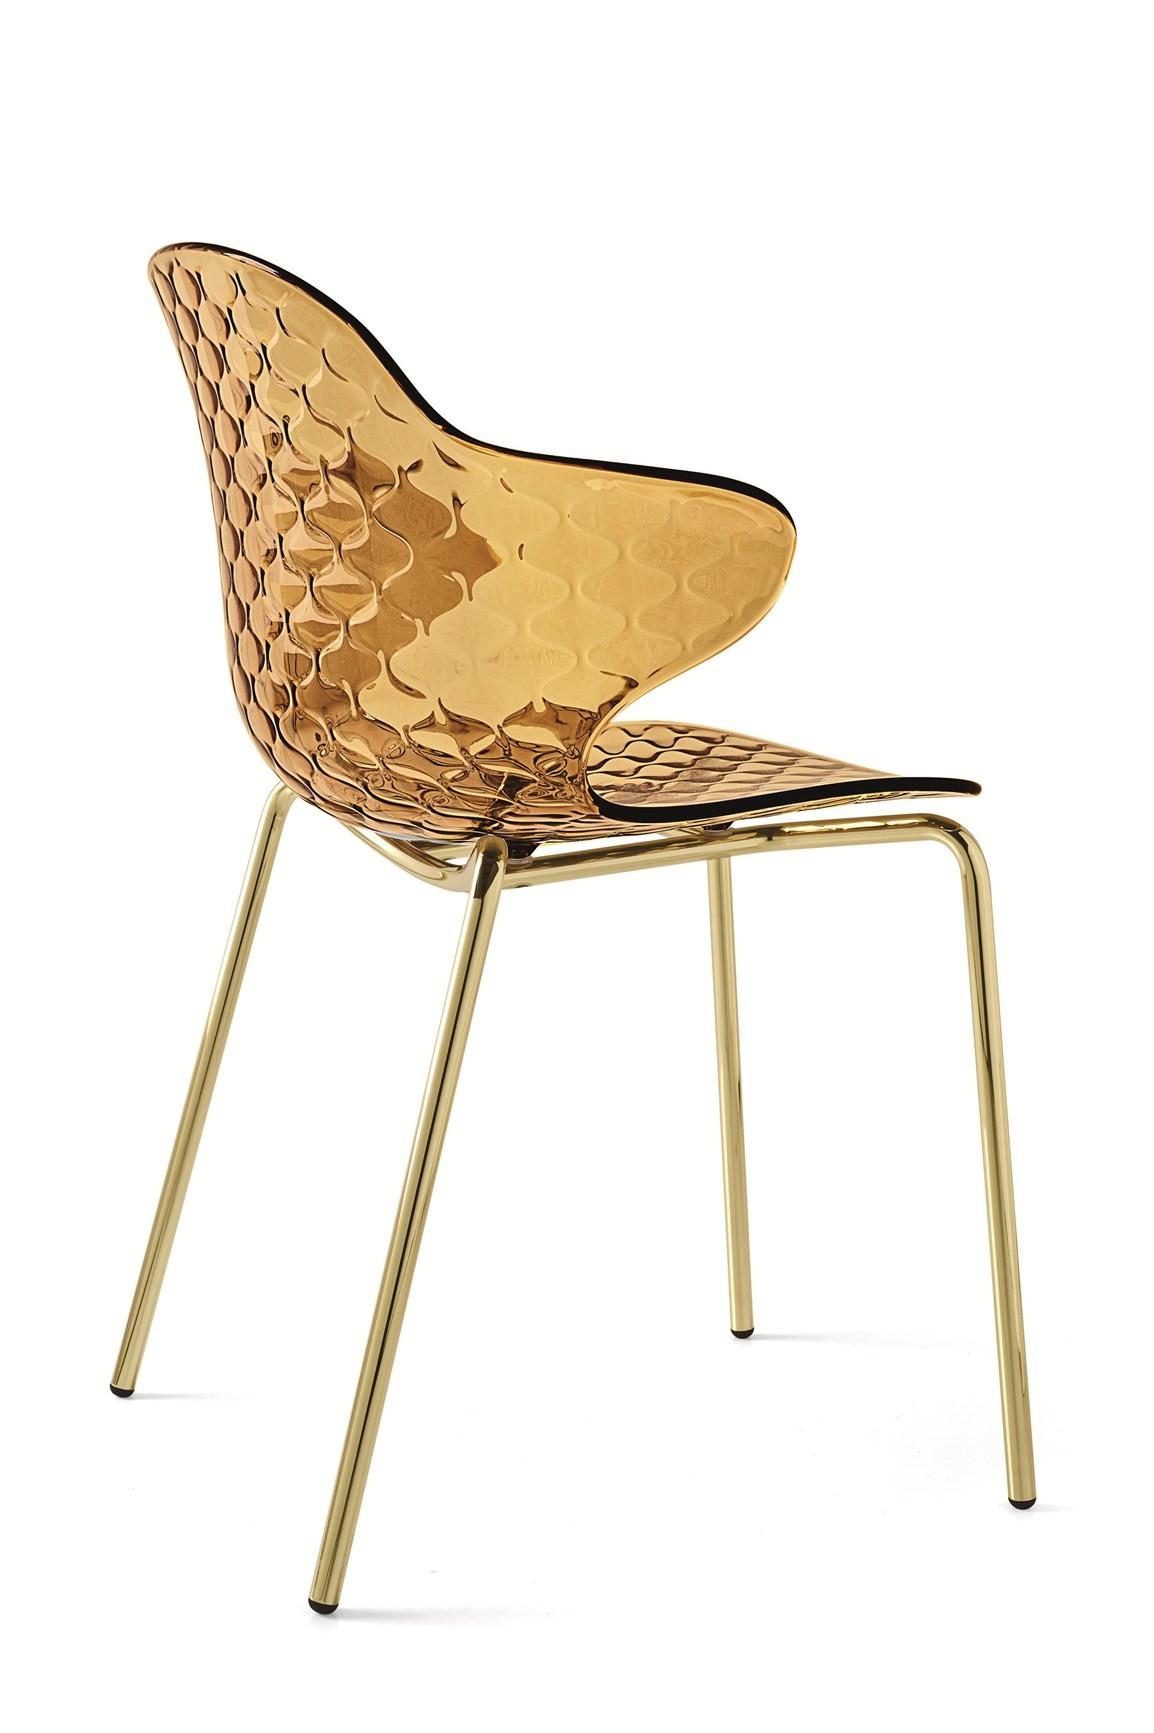 Tavoli e Sedie - Deiana Mobili